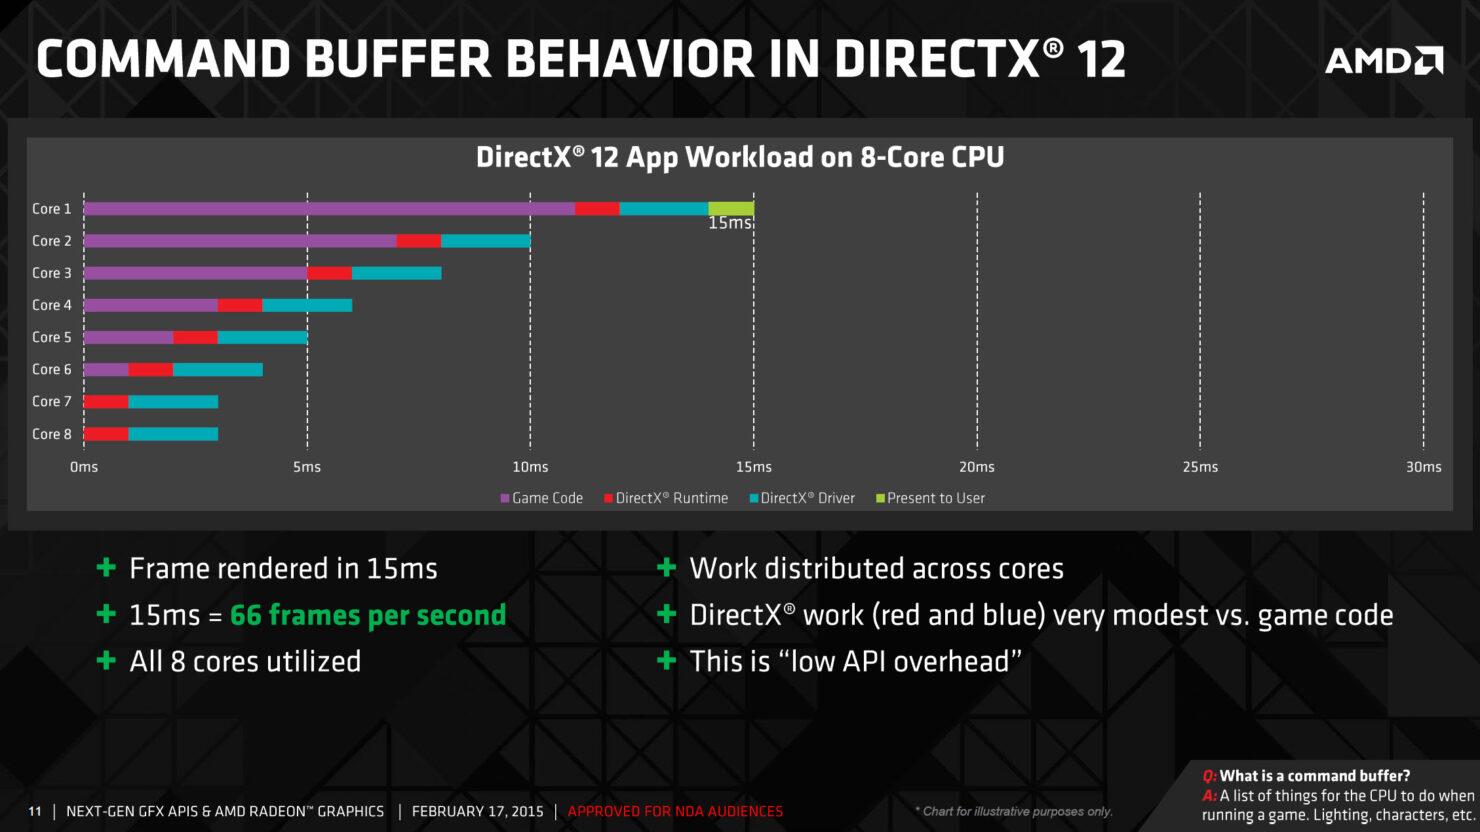 amd-command-buffer-directx-12